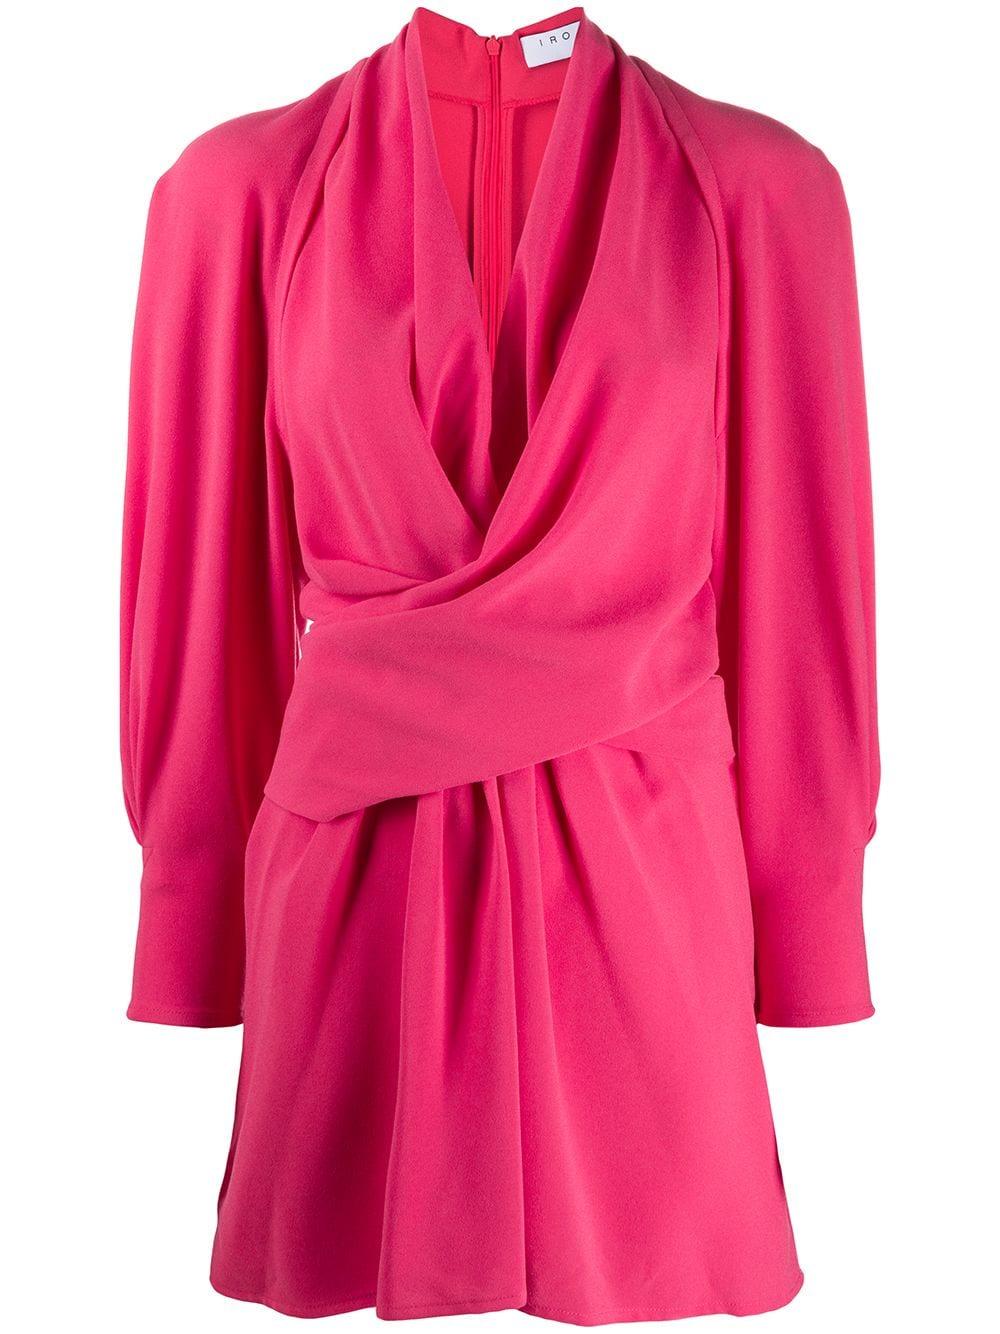 Gibral Dress